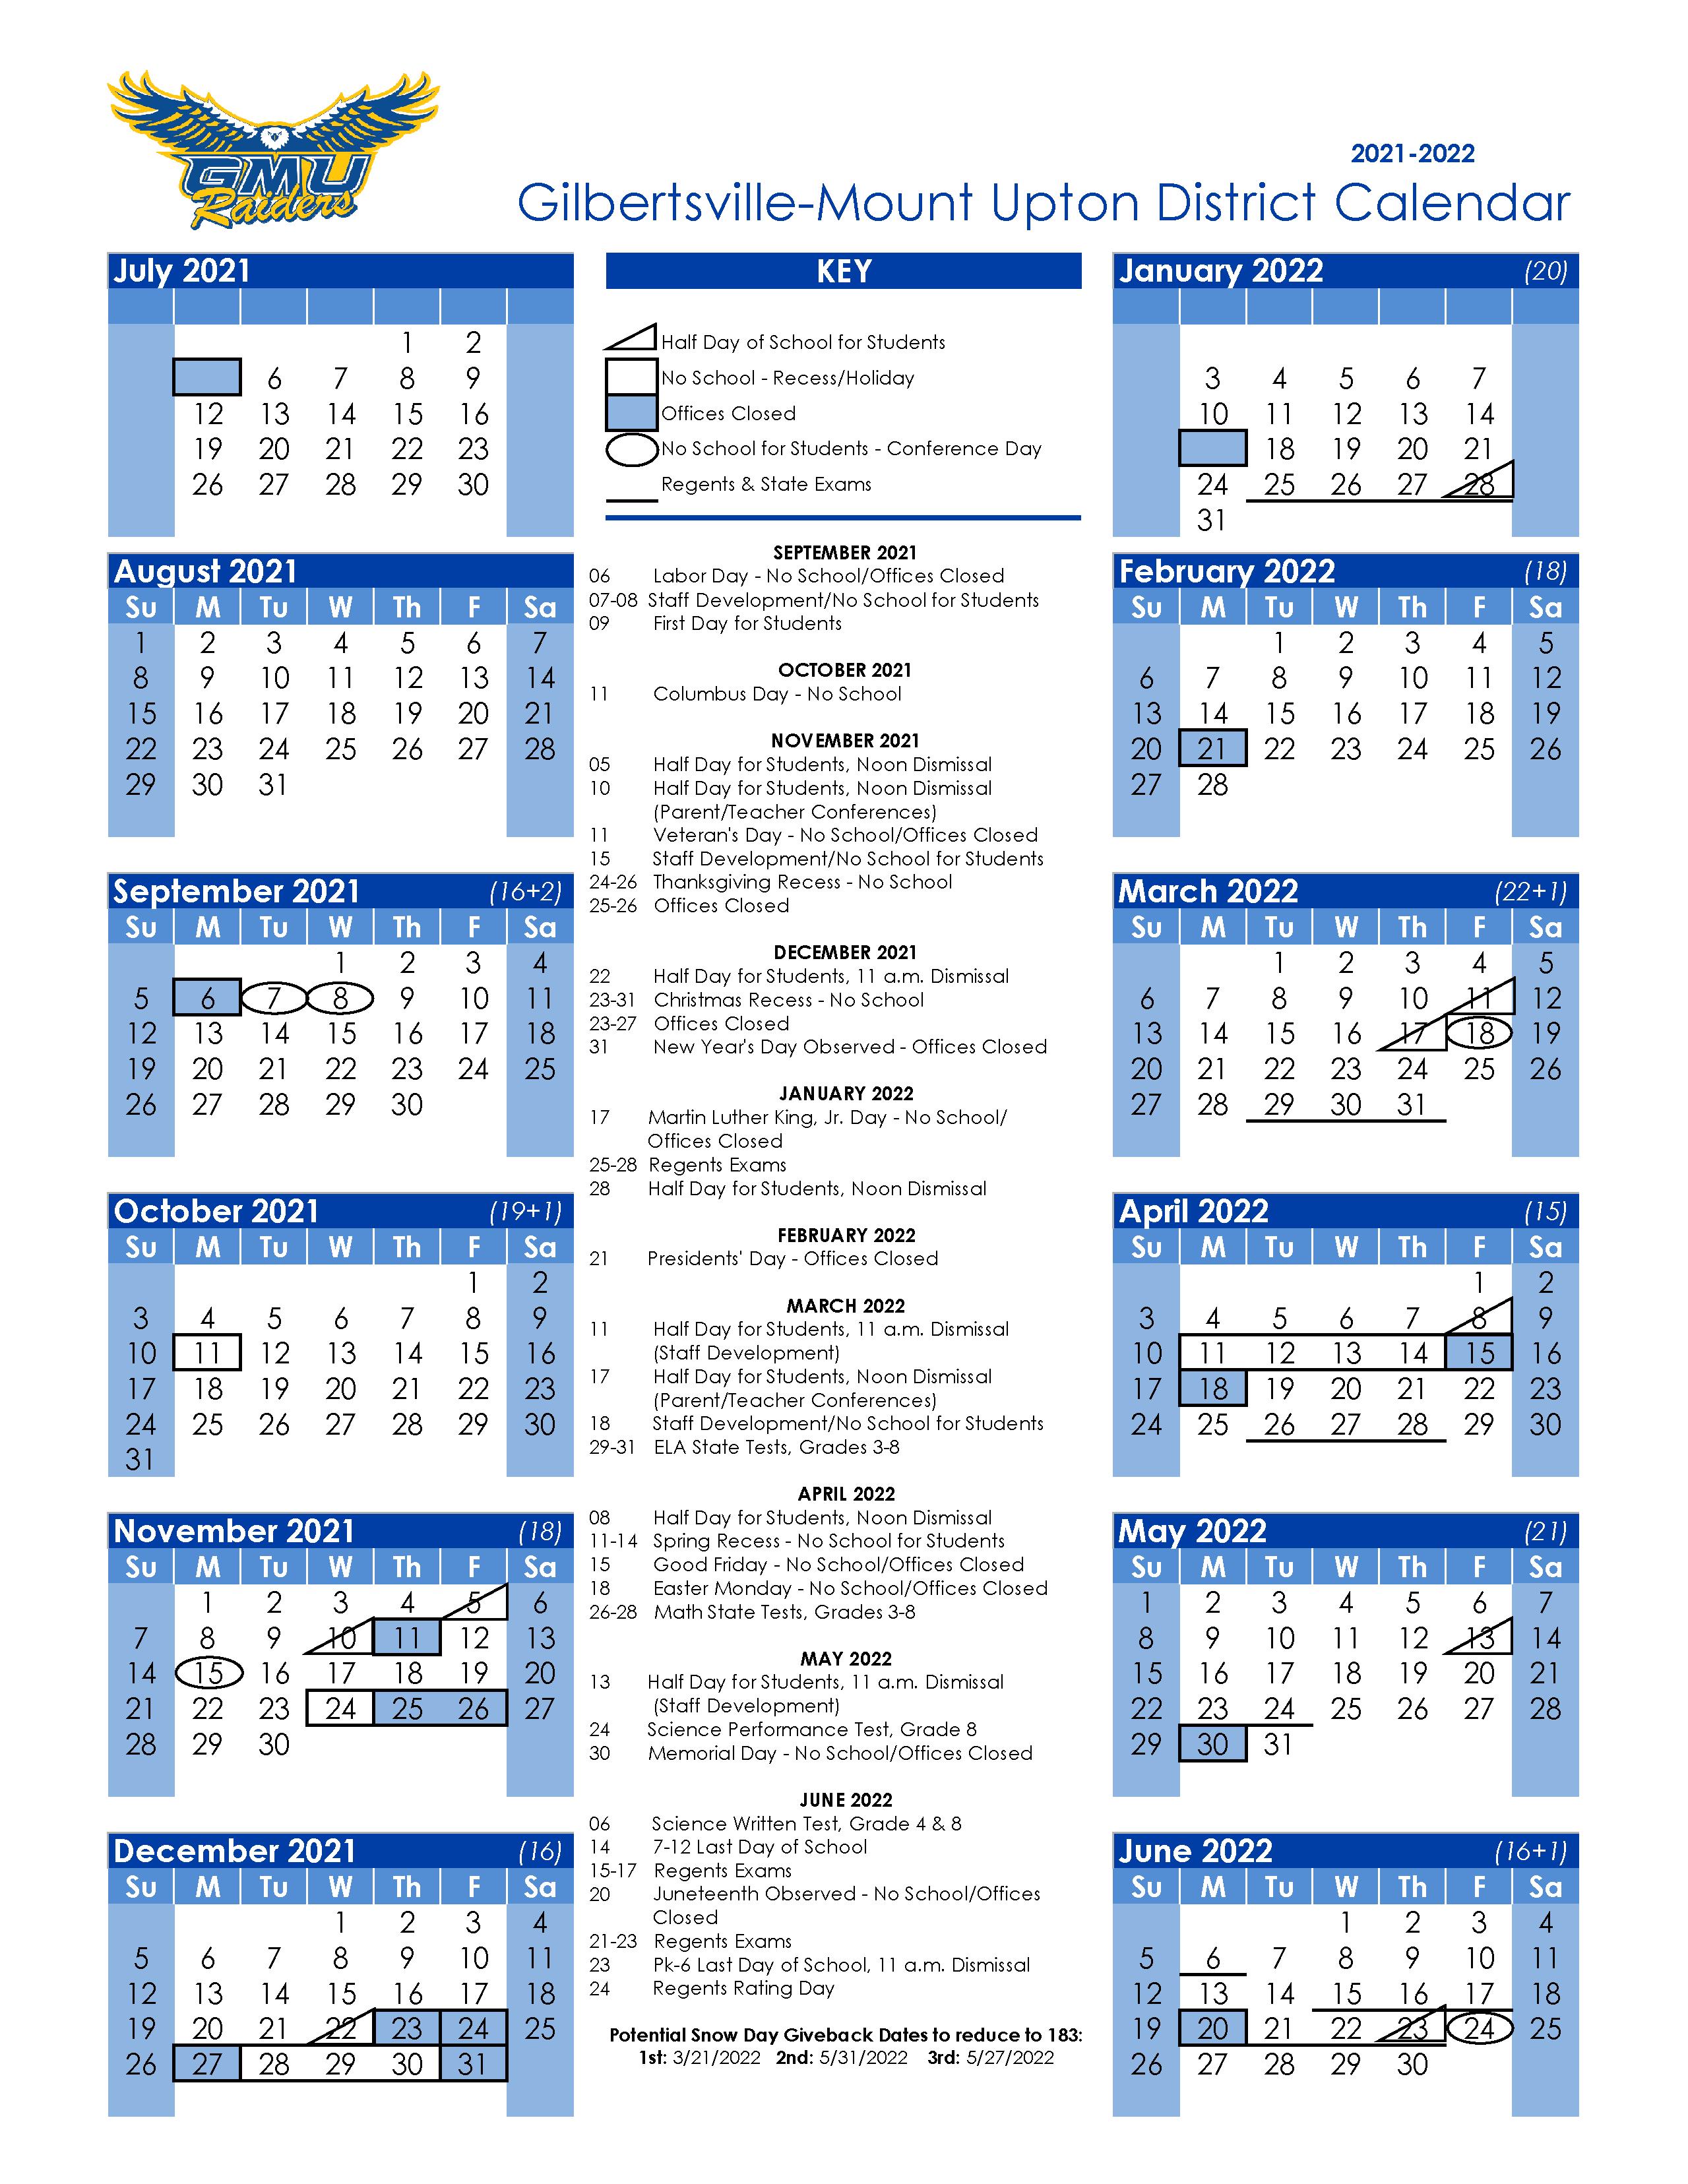 Image of the 2021 - 2022 School Year Calendar